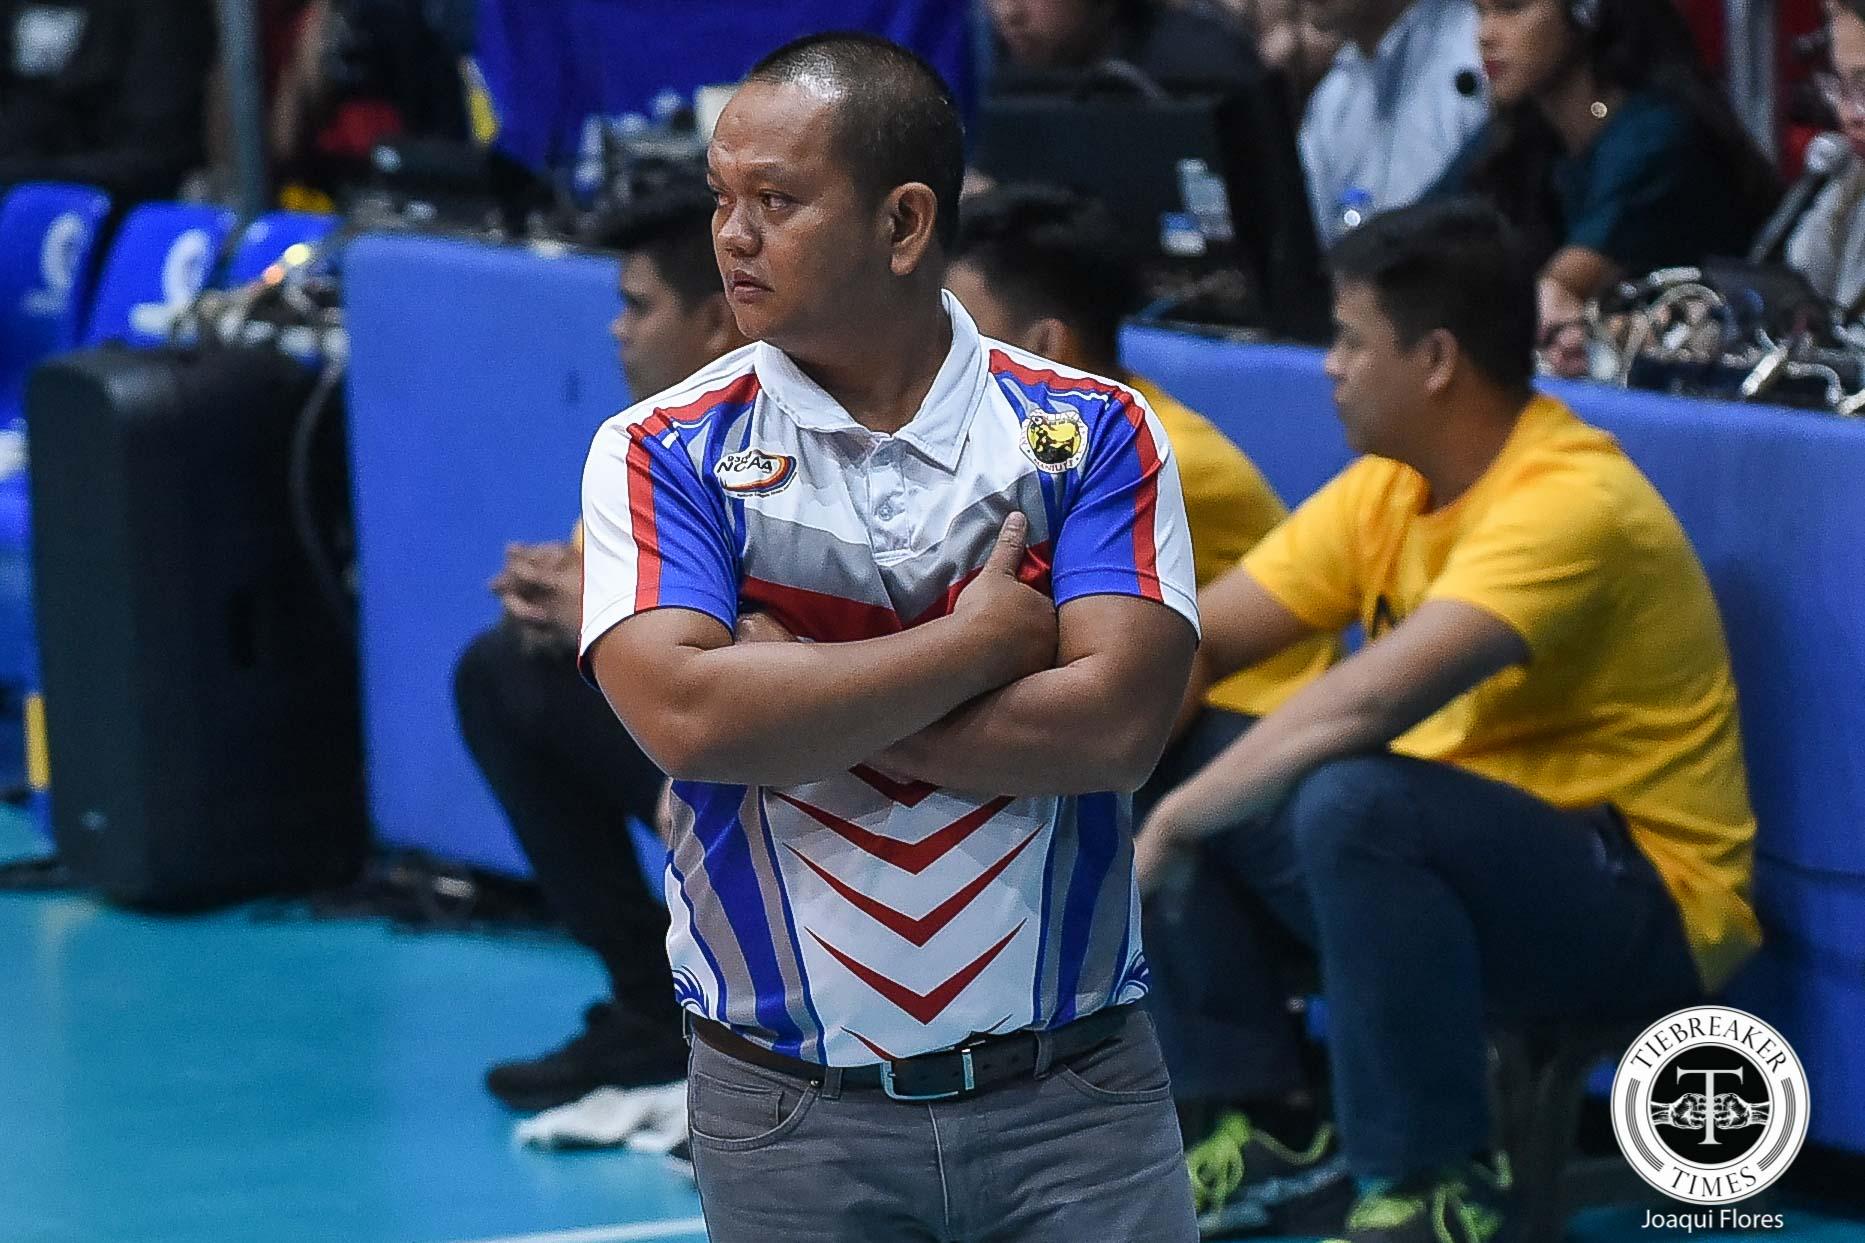 NCAA-94-Volleyball-SBU-vs.-AU-Obet-Javier-0256 Minor setback serves as wake up call to Regine Arocha, Arellano AU NCAA News Volleyball  - philippine sports news